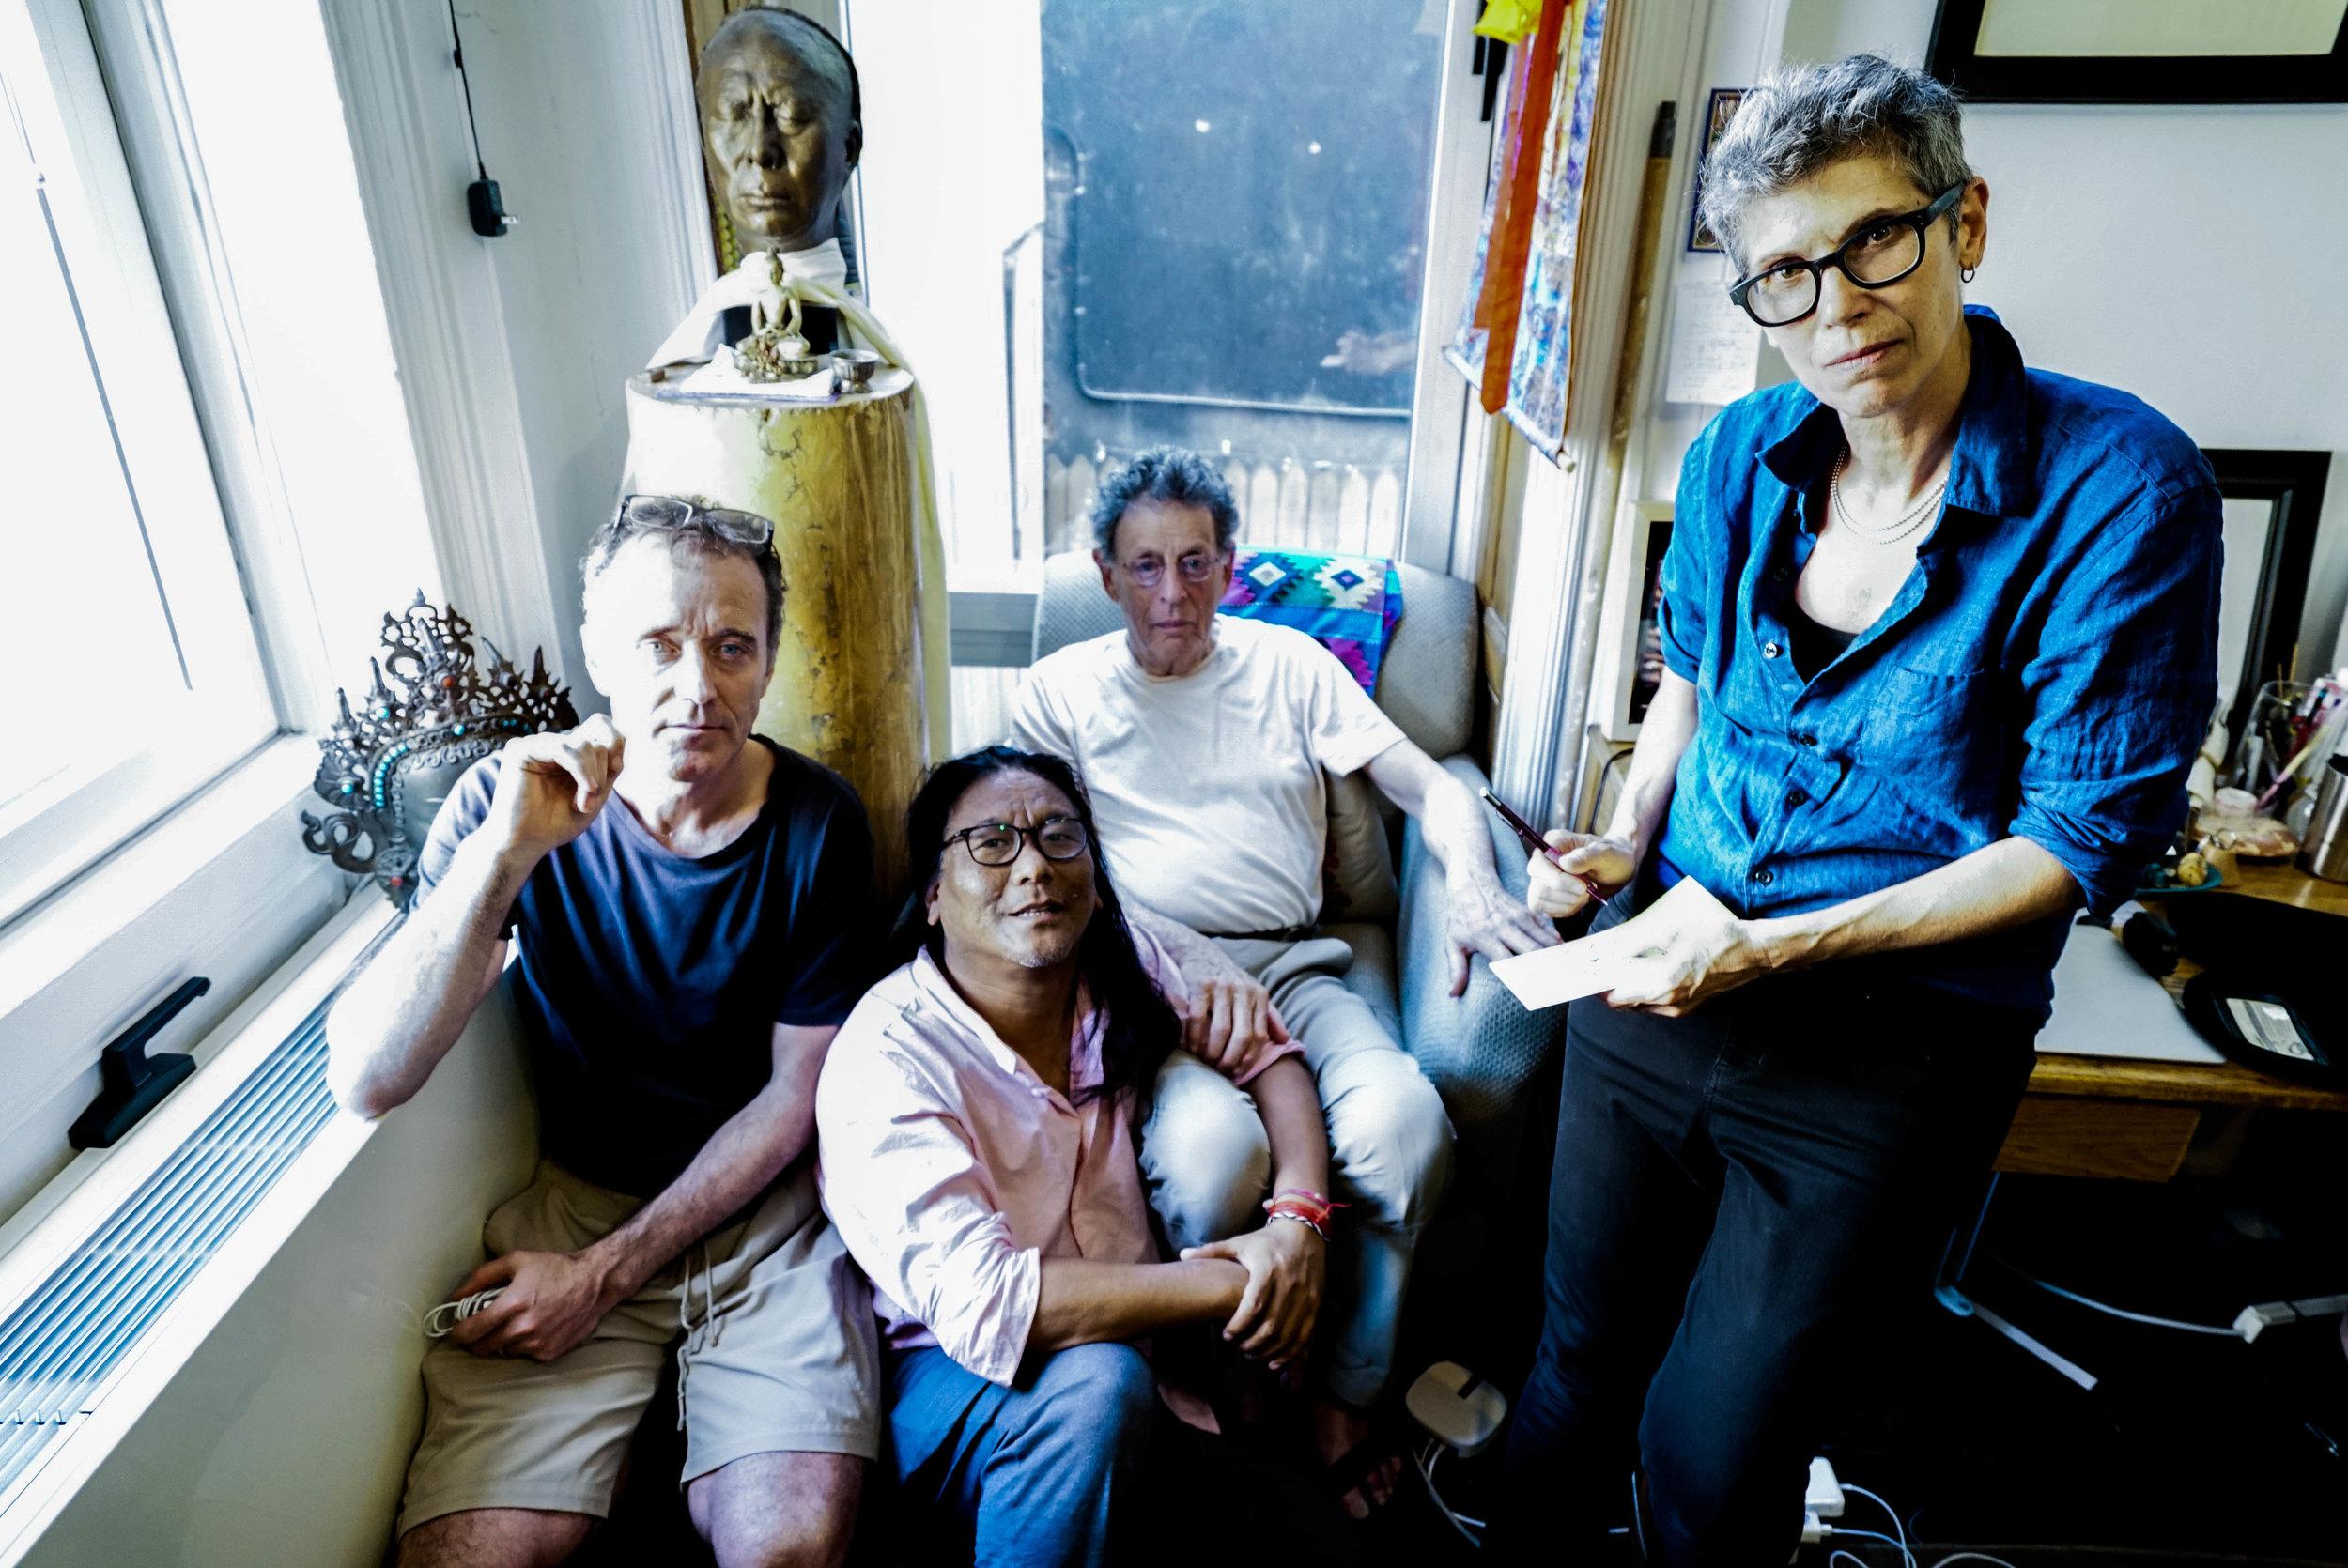 Left to right: Kevin Joyce, Tenzin Choegyal, Philip Glass, Nikki Appino